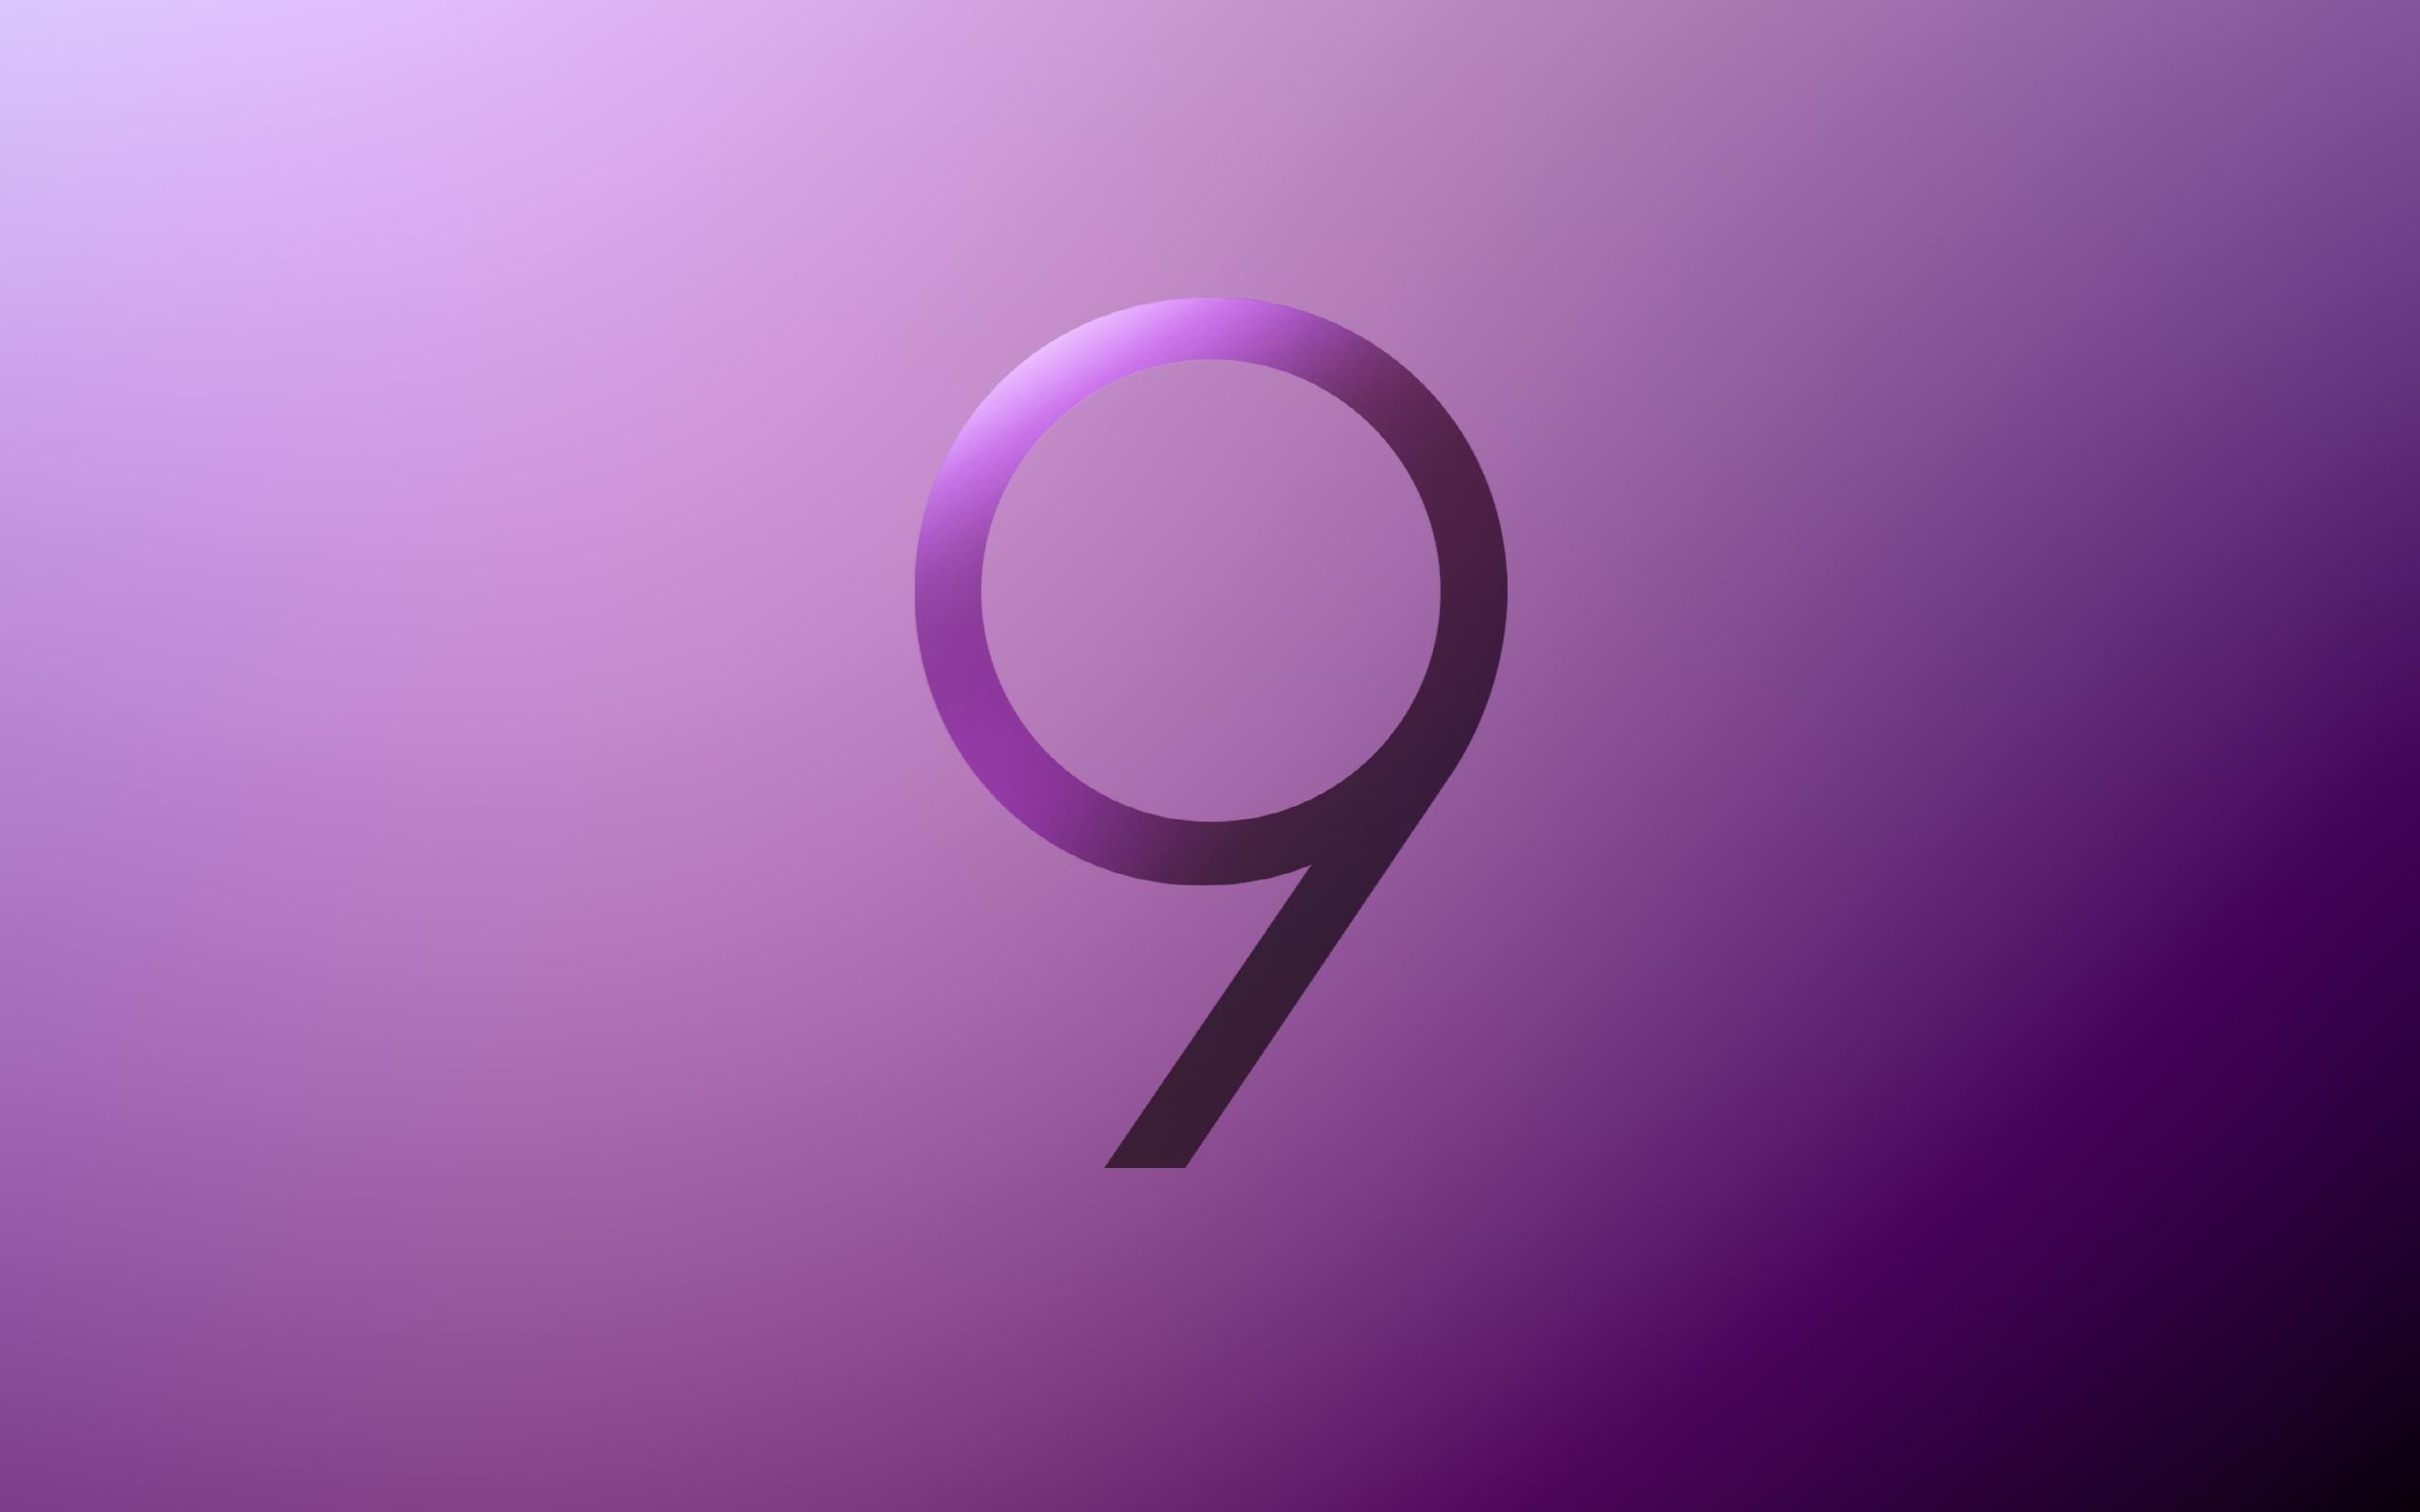 Samsung Galaxy S9 Stock Purple Galaxy Purple Samsung Stock